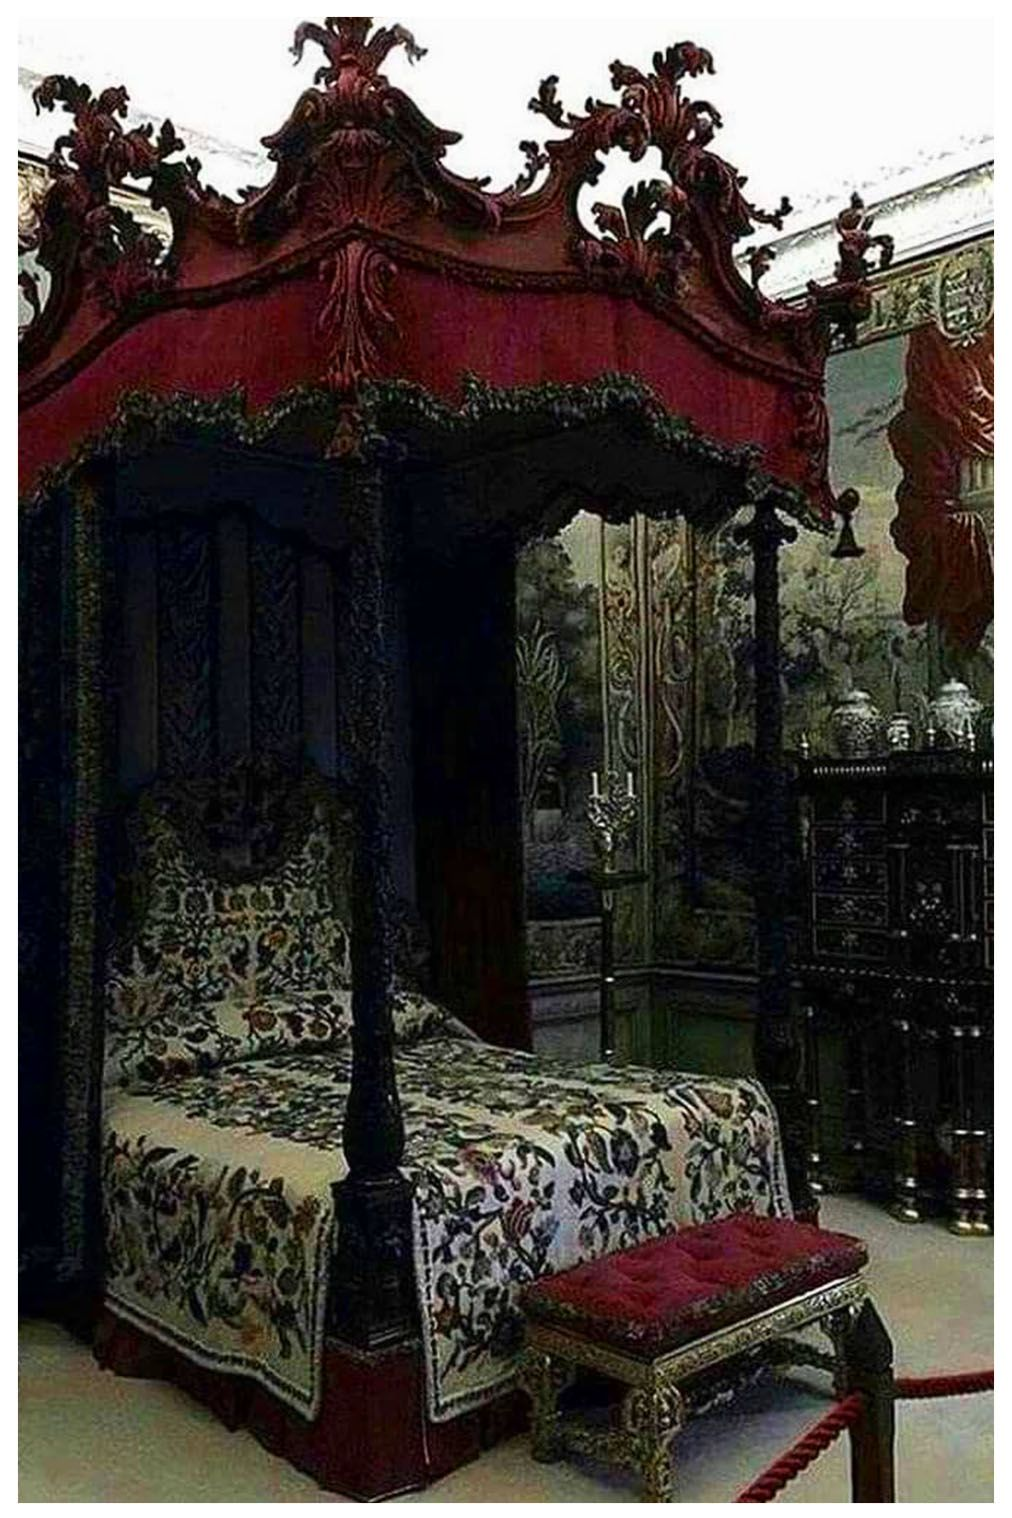 Gothic Bedroom Ideas 40 Believe Design How To Decorate Gothic Bedroom Furniture Gothic Decor Bedroom Gothic Interior